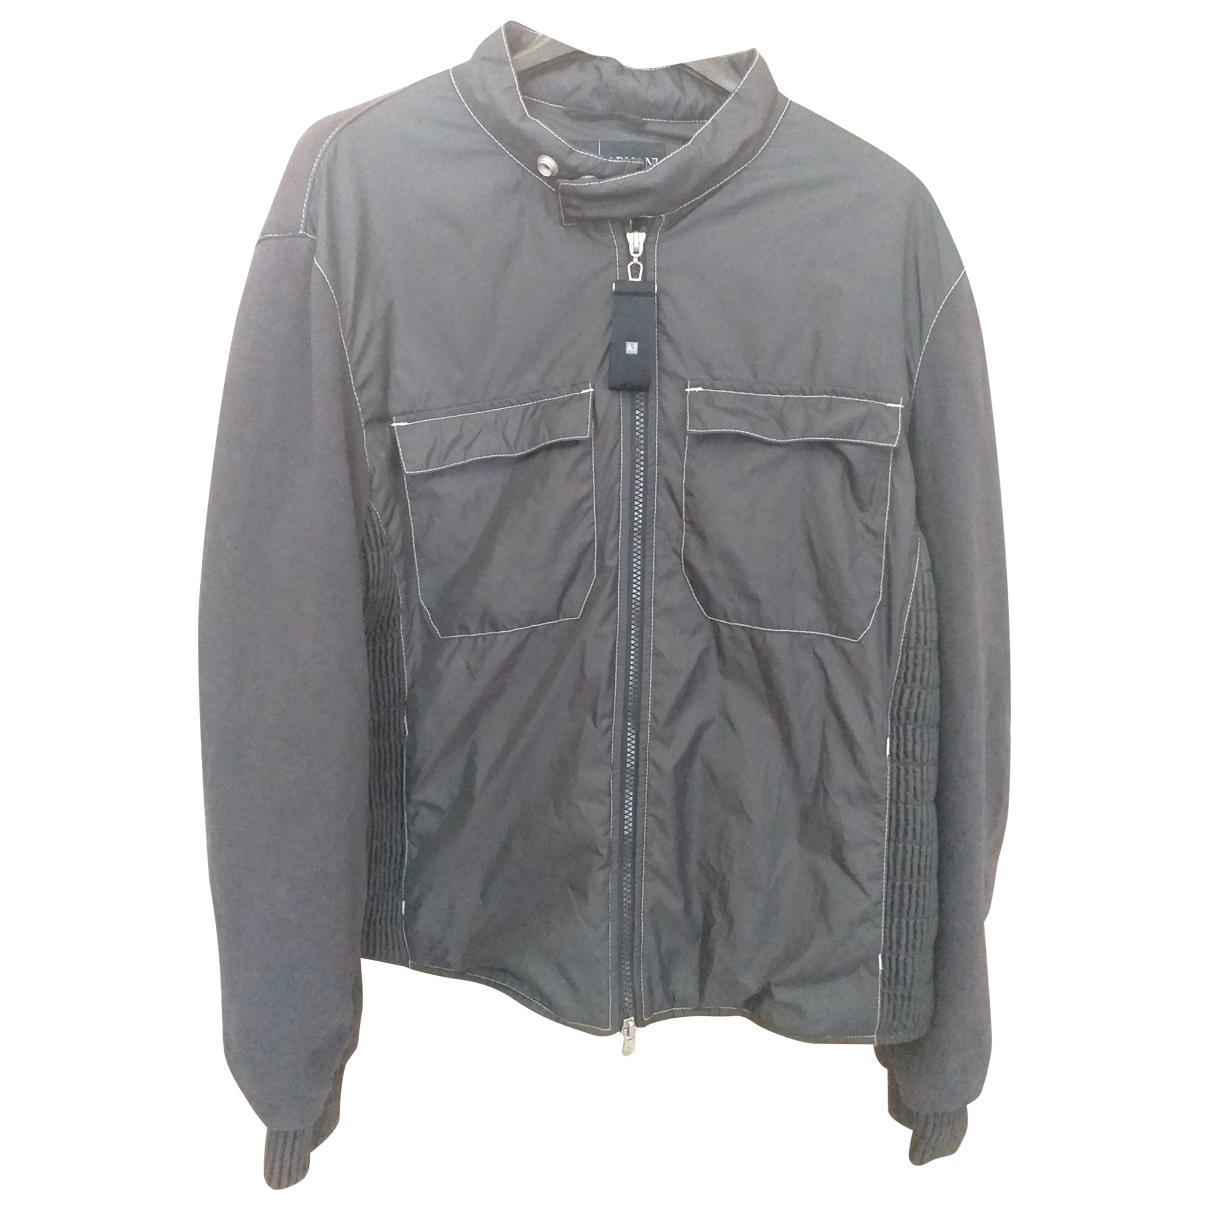 Armani Jeans \N Jacke in  Grau Baumwolle